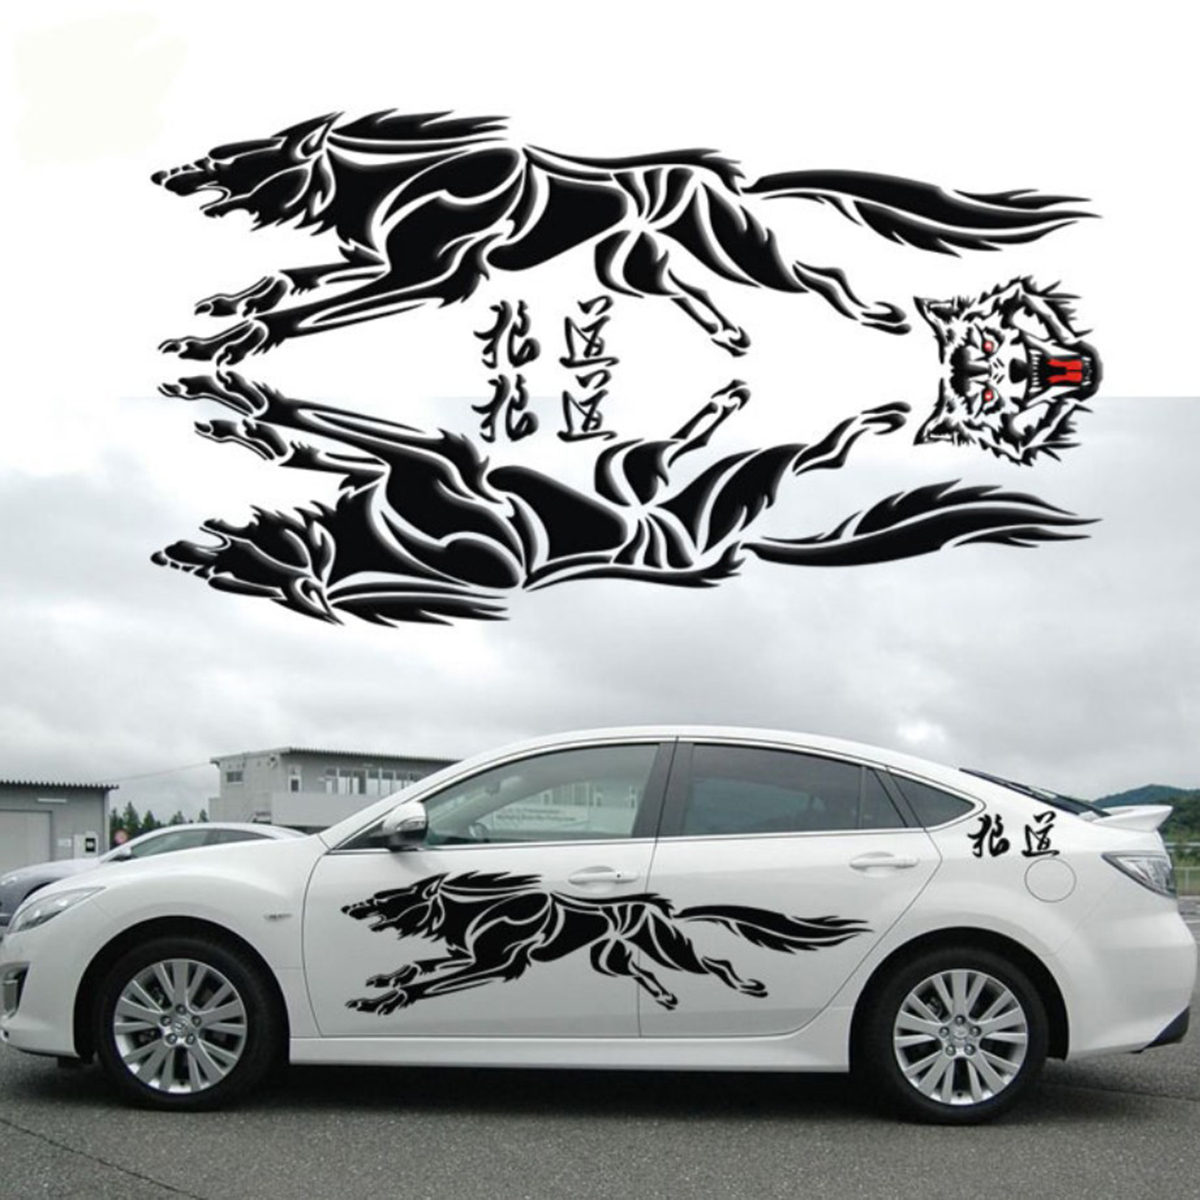 Car full body sticker design - Modified Vehicle Applique Full Car Body Garland Decorative Wolf Totem Stickers For Bmw Honda Toyota Hyundai